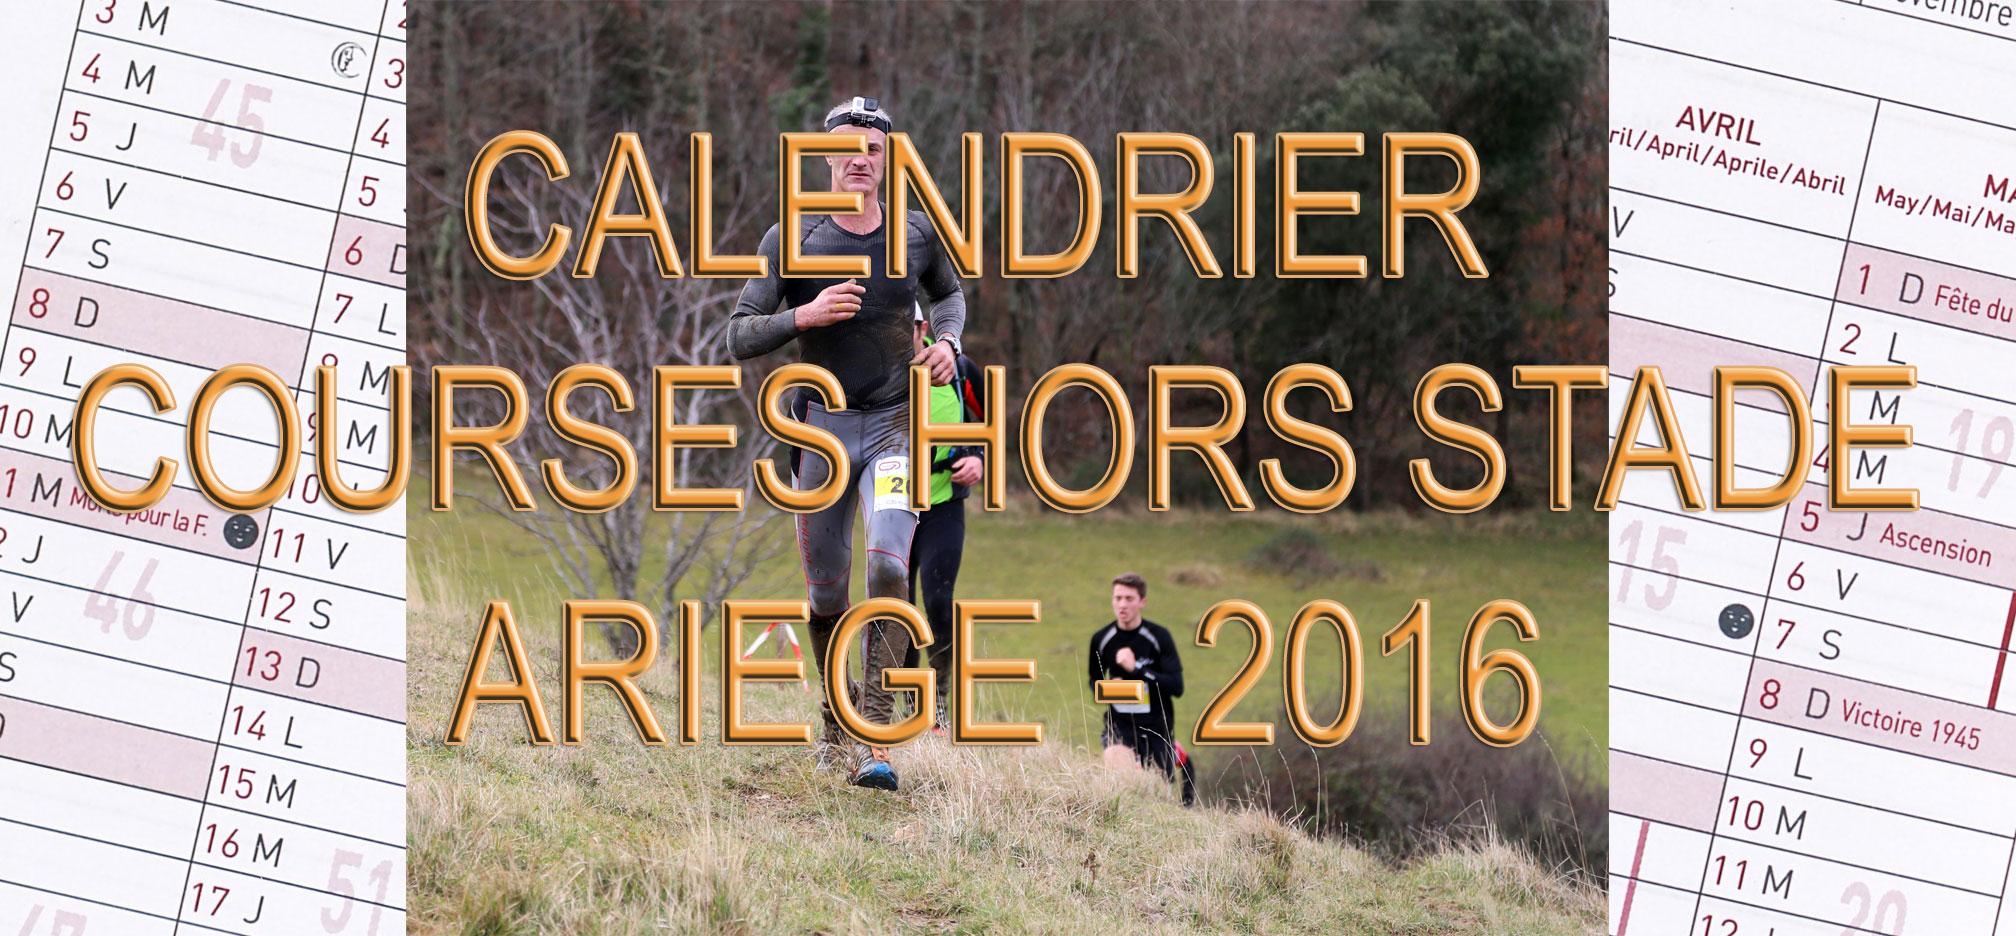 Calendrier Des Courses Hors Stade.Calendrier Courses Hors Stade Ariege 2016 Midi Run